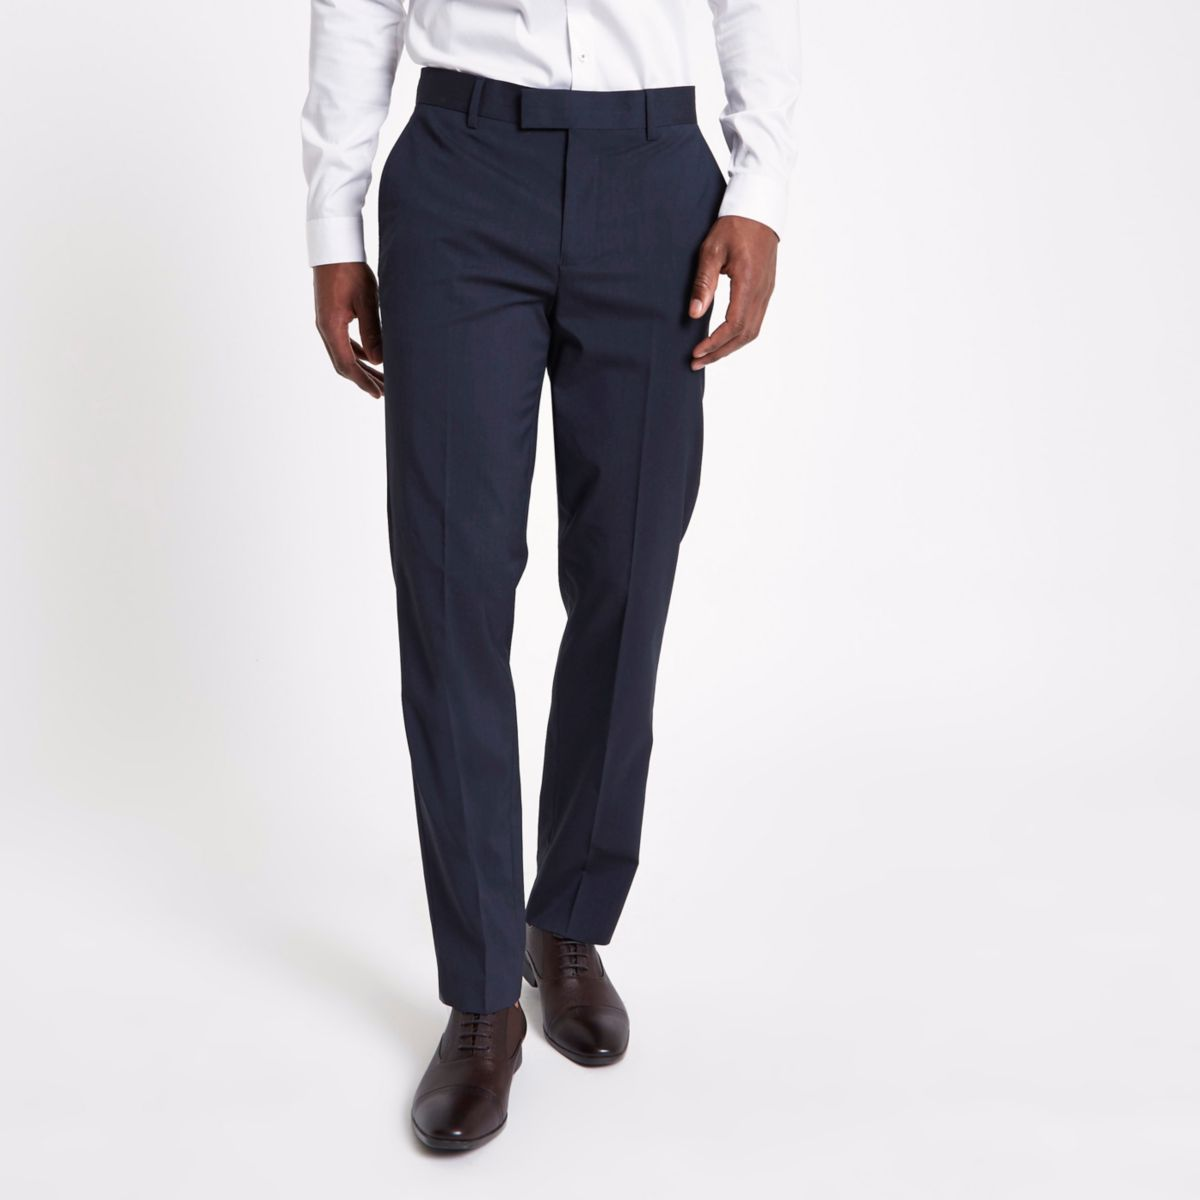 Marineblauwe pantalon met slanke pasvorm